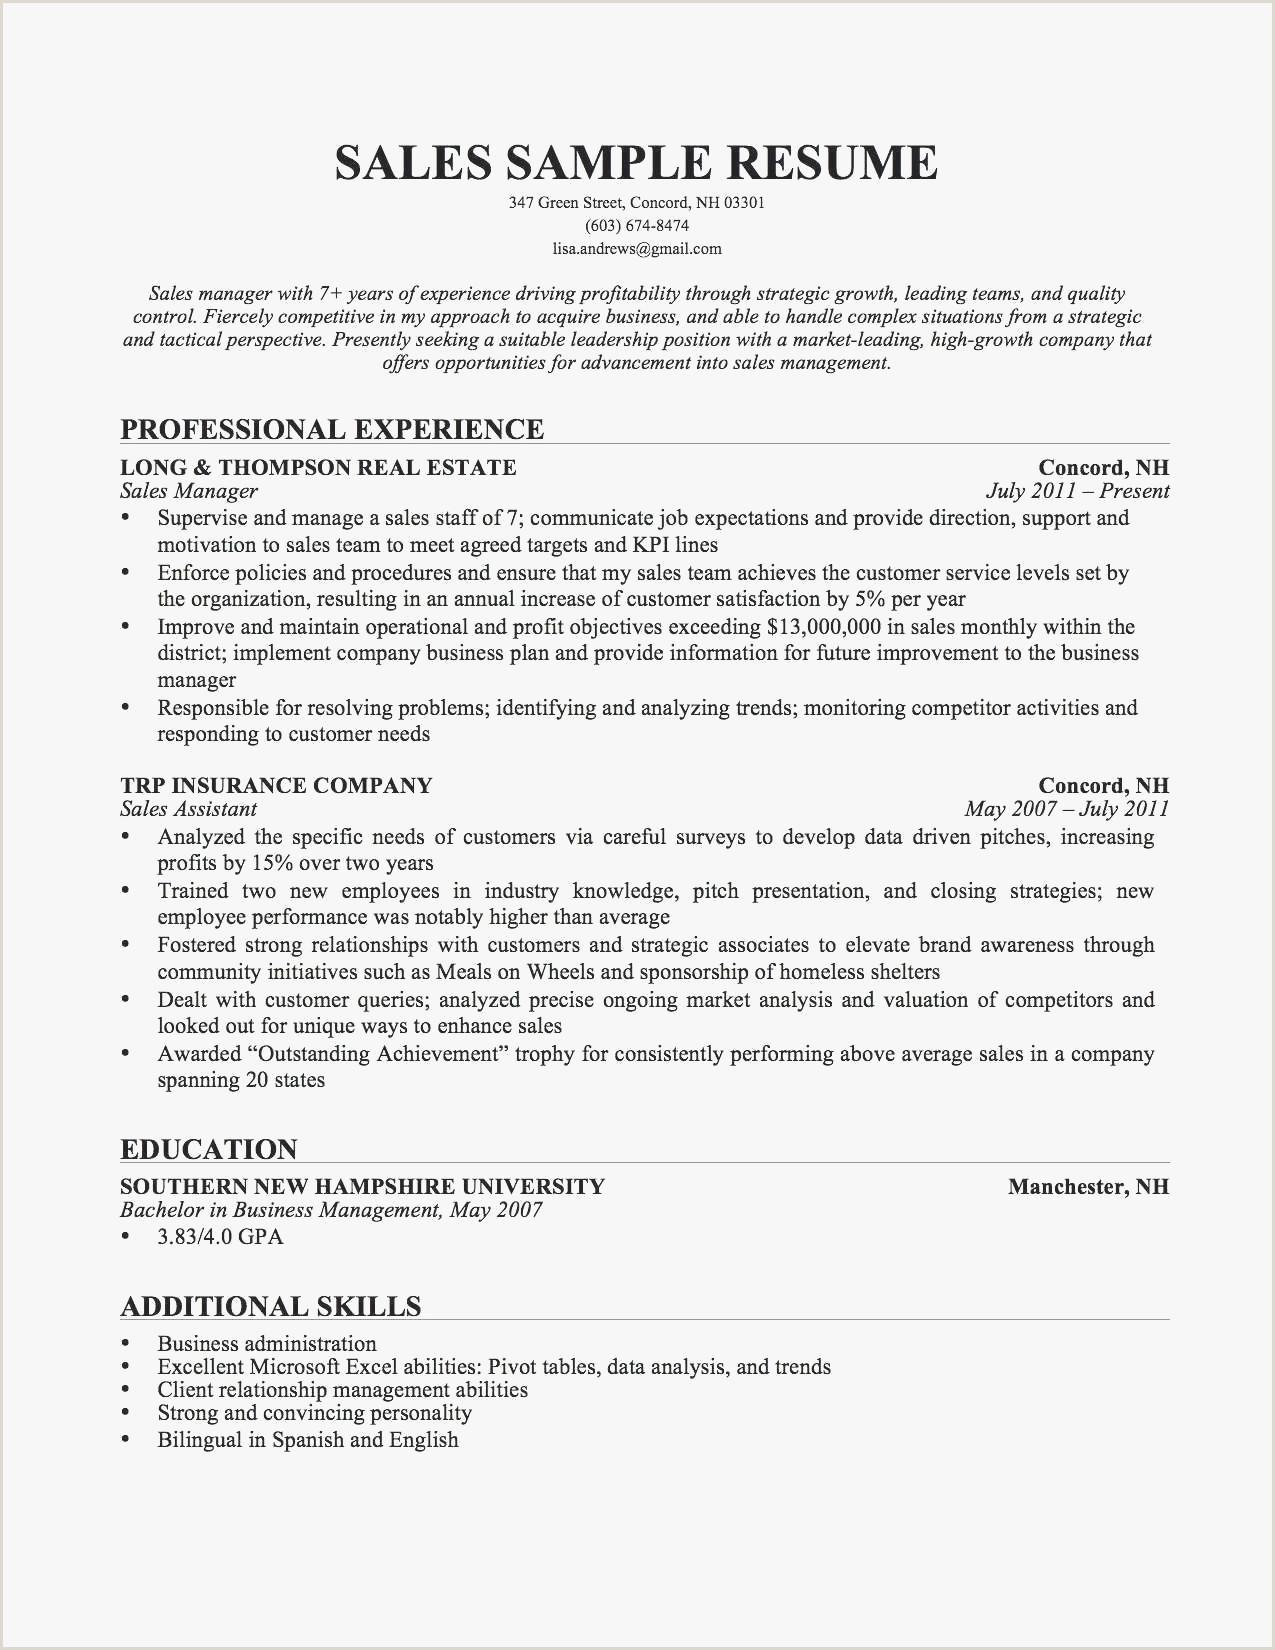 Cv Format For Driving Job Free Student Resume Templates Sample Social Work Resume